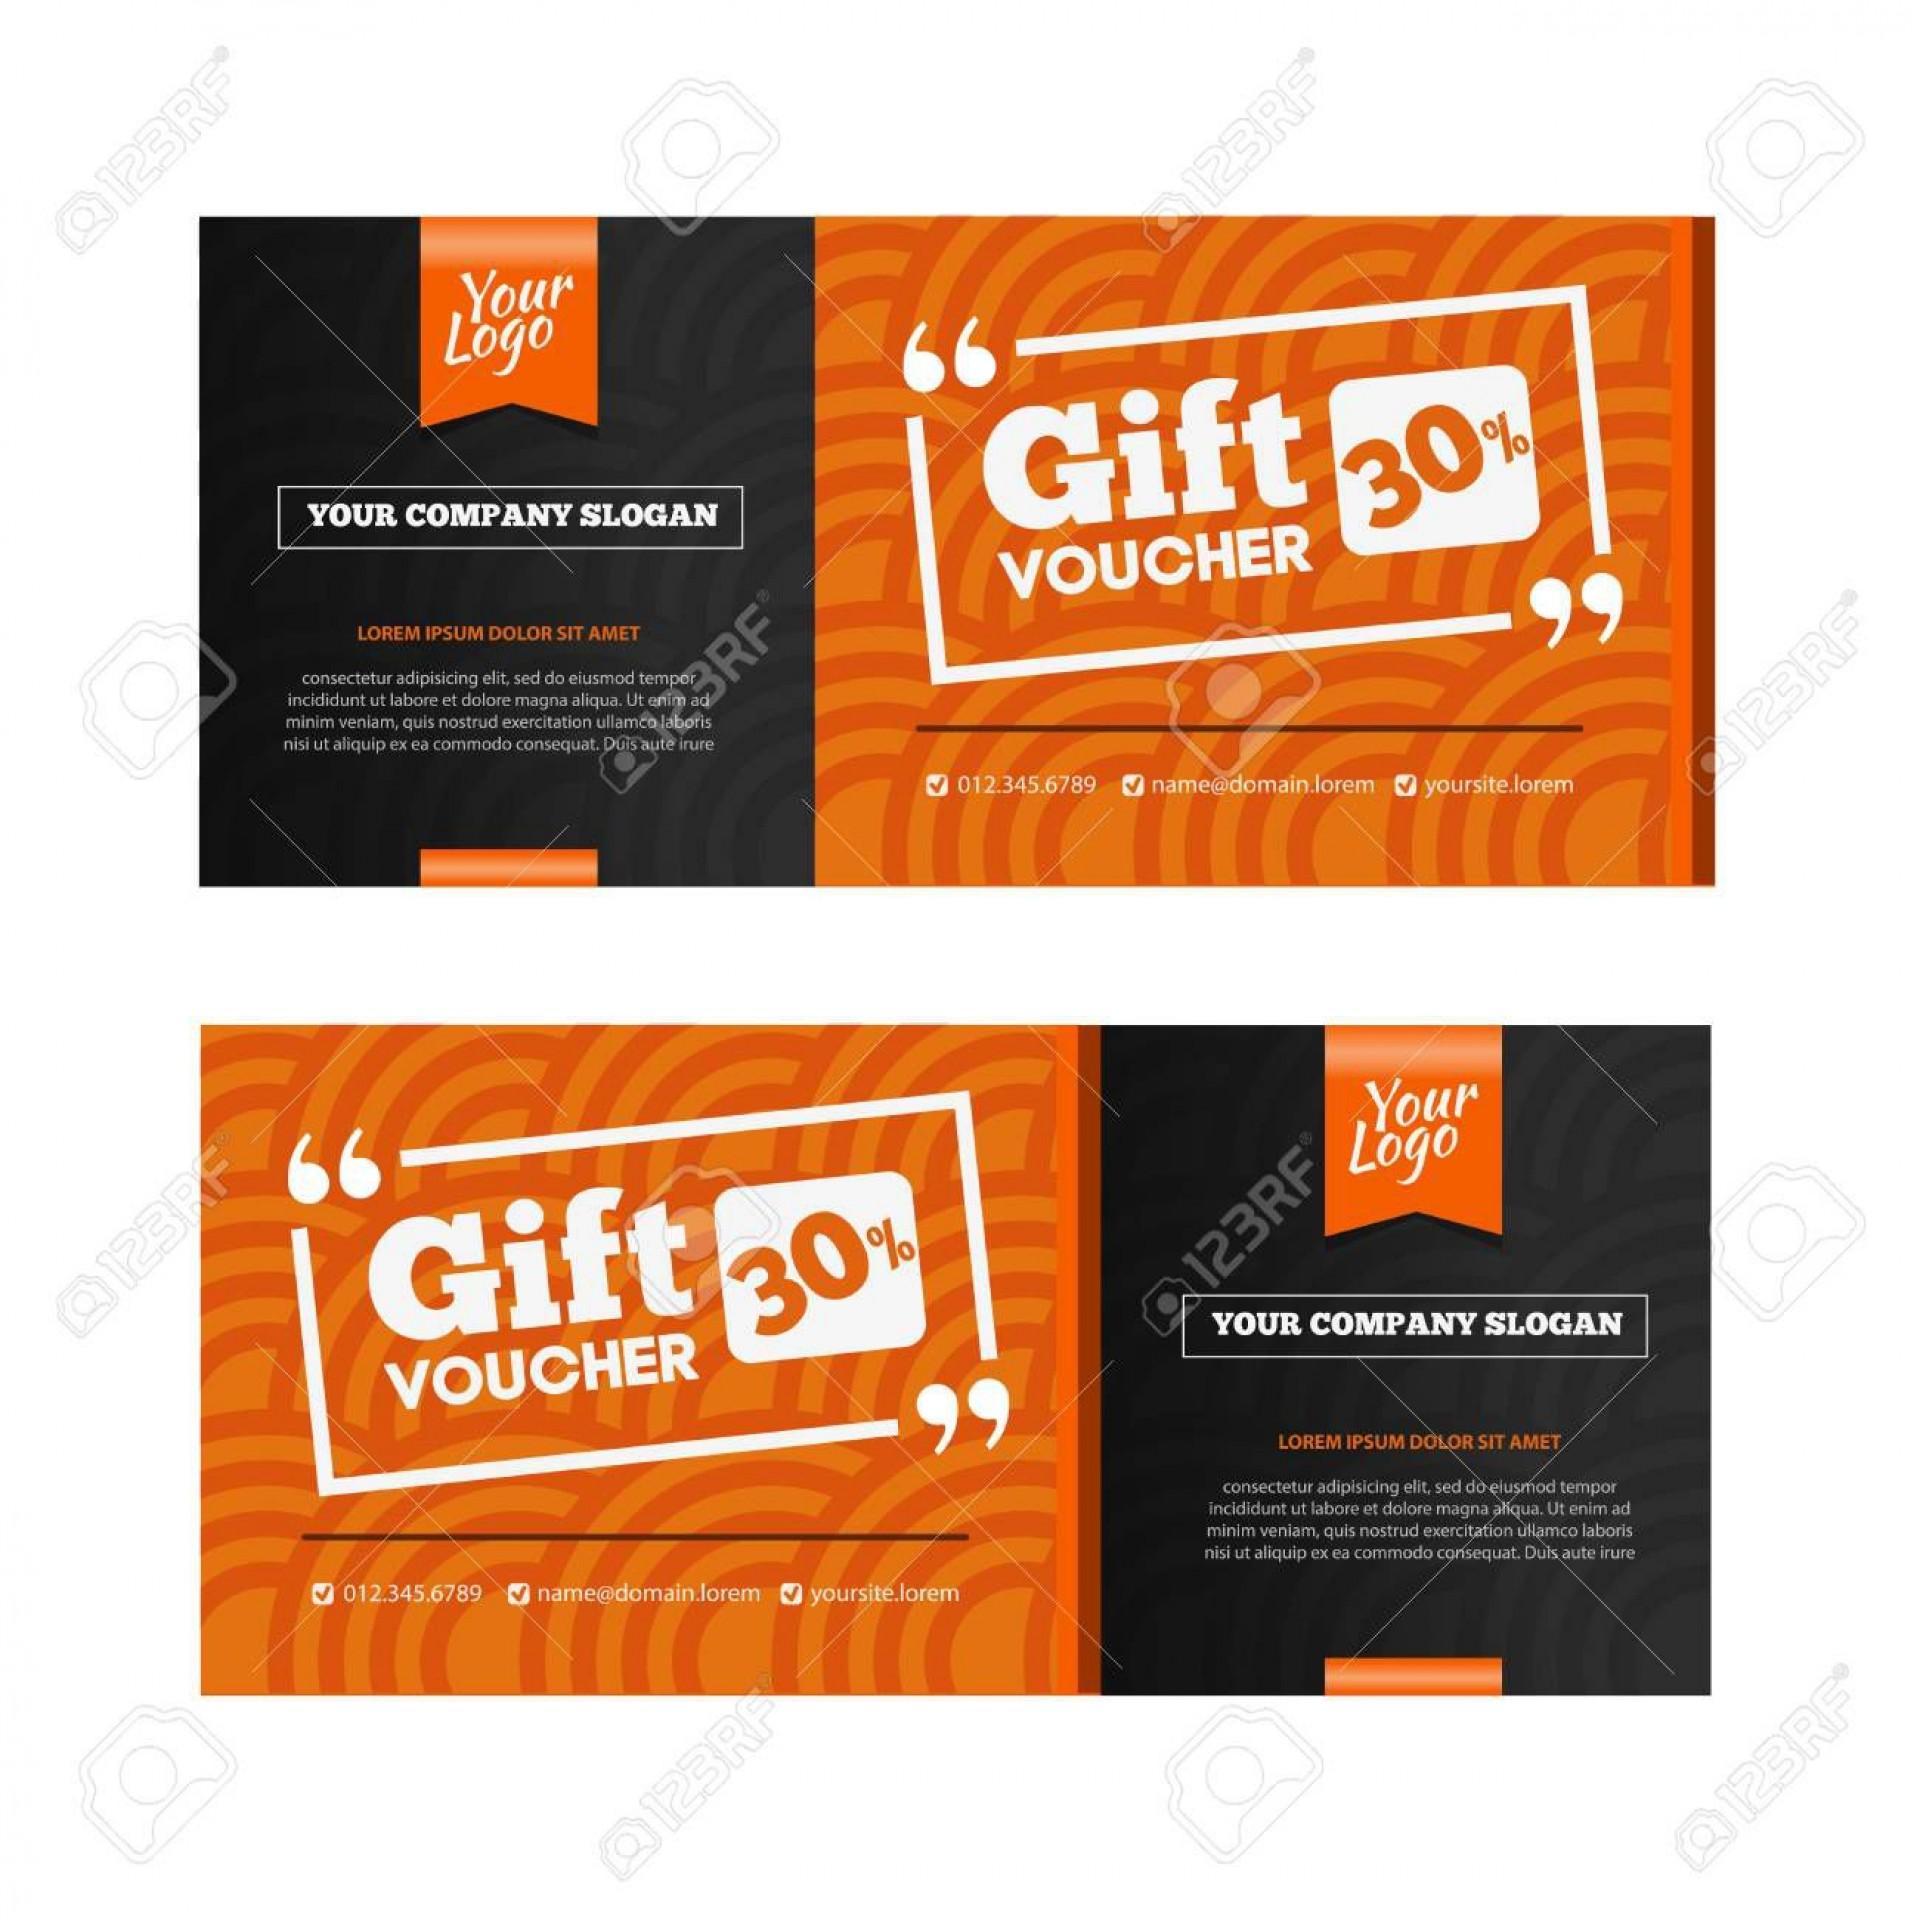 005 Outstanding Restaurant Gift Certificate Template Highest Clarity  Templates Card Word Voucher Free1920